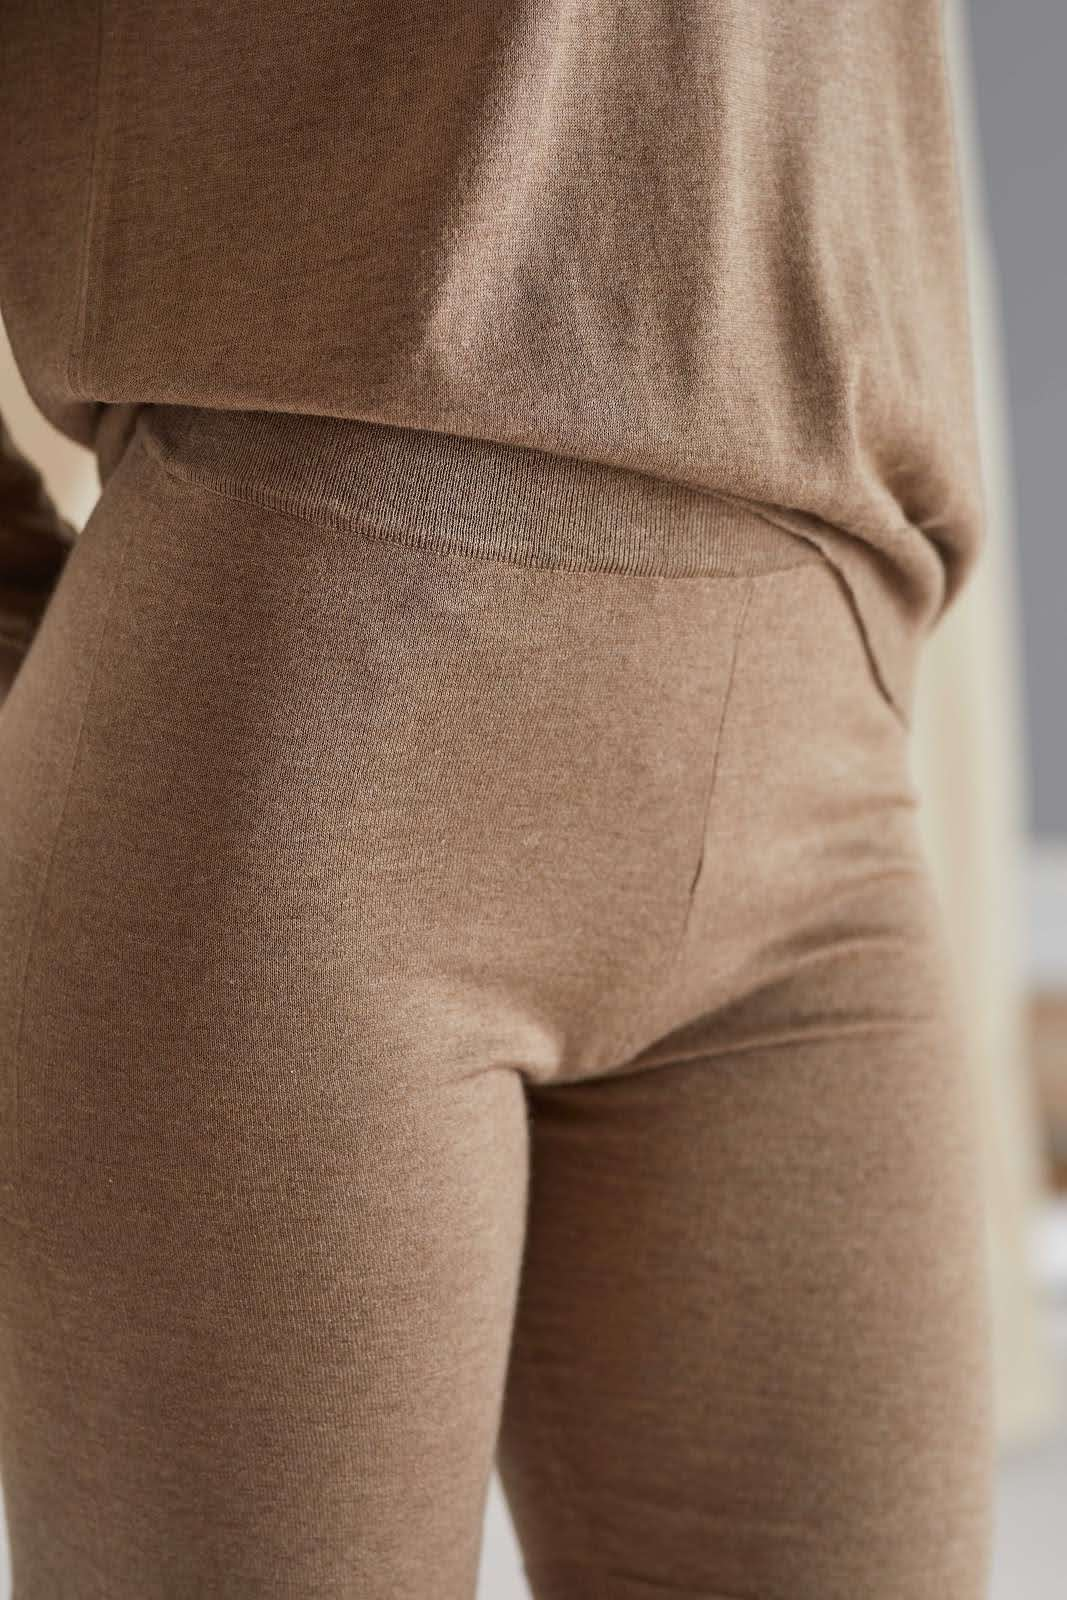 Fine Knit Bike Shorts